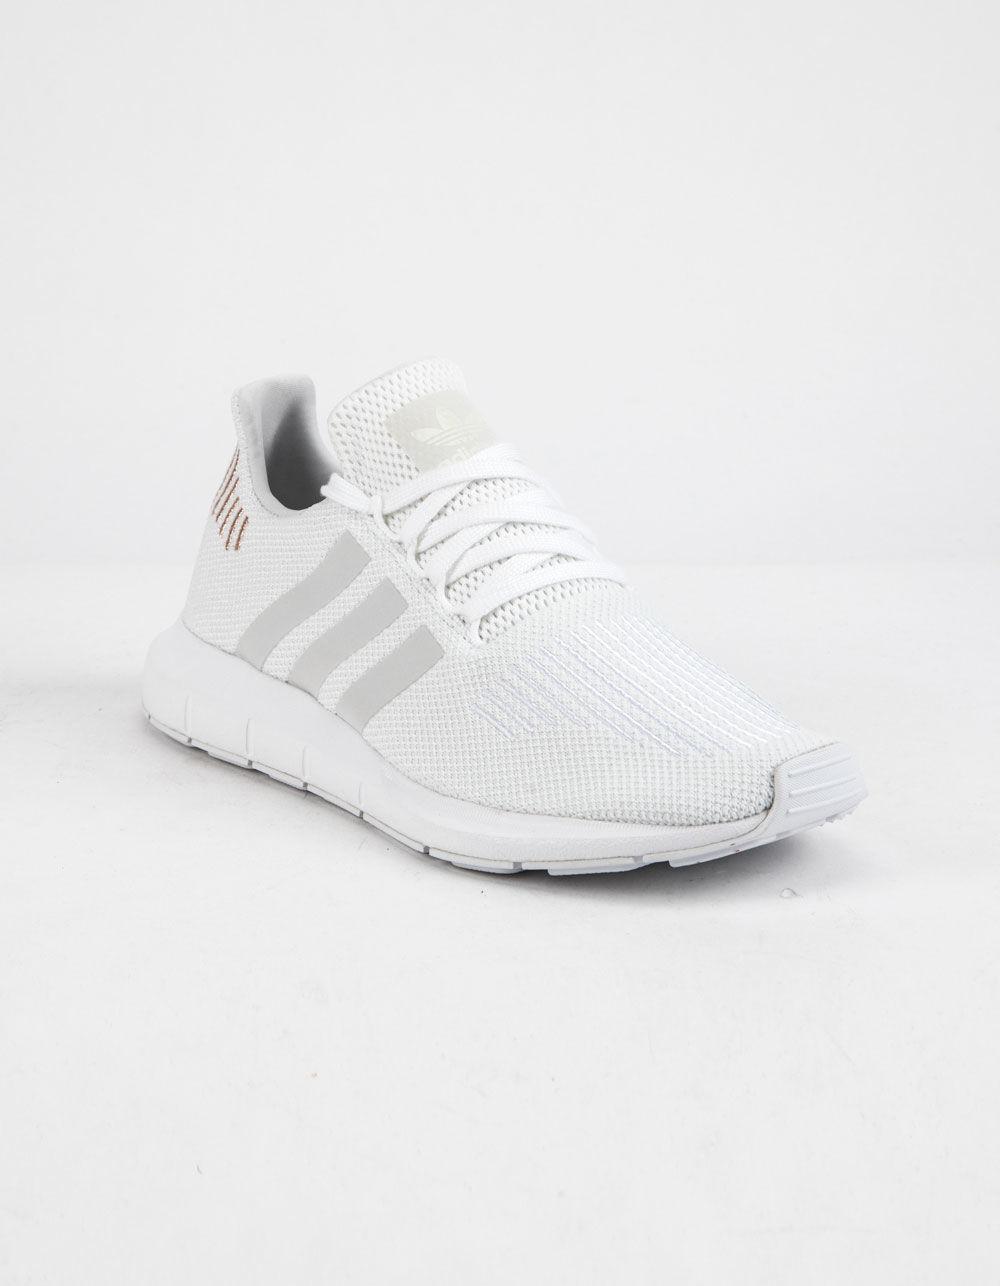 Lyst - adidas Swift Run Cloud White   Crystal White Womens Shoes in White ef10baa7e